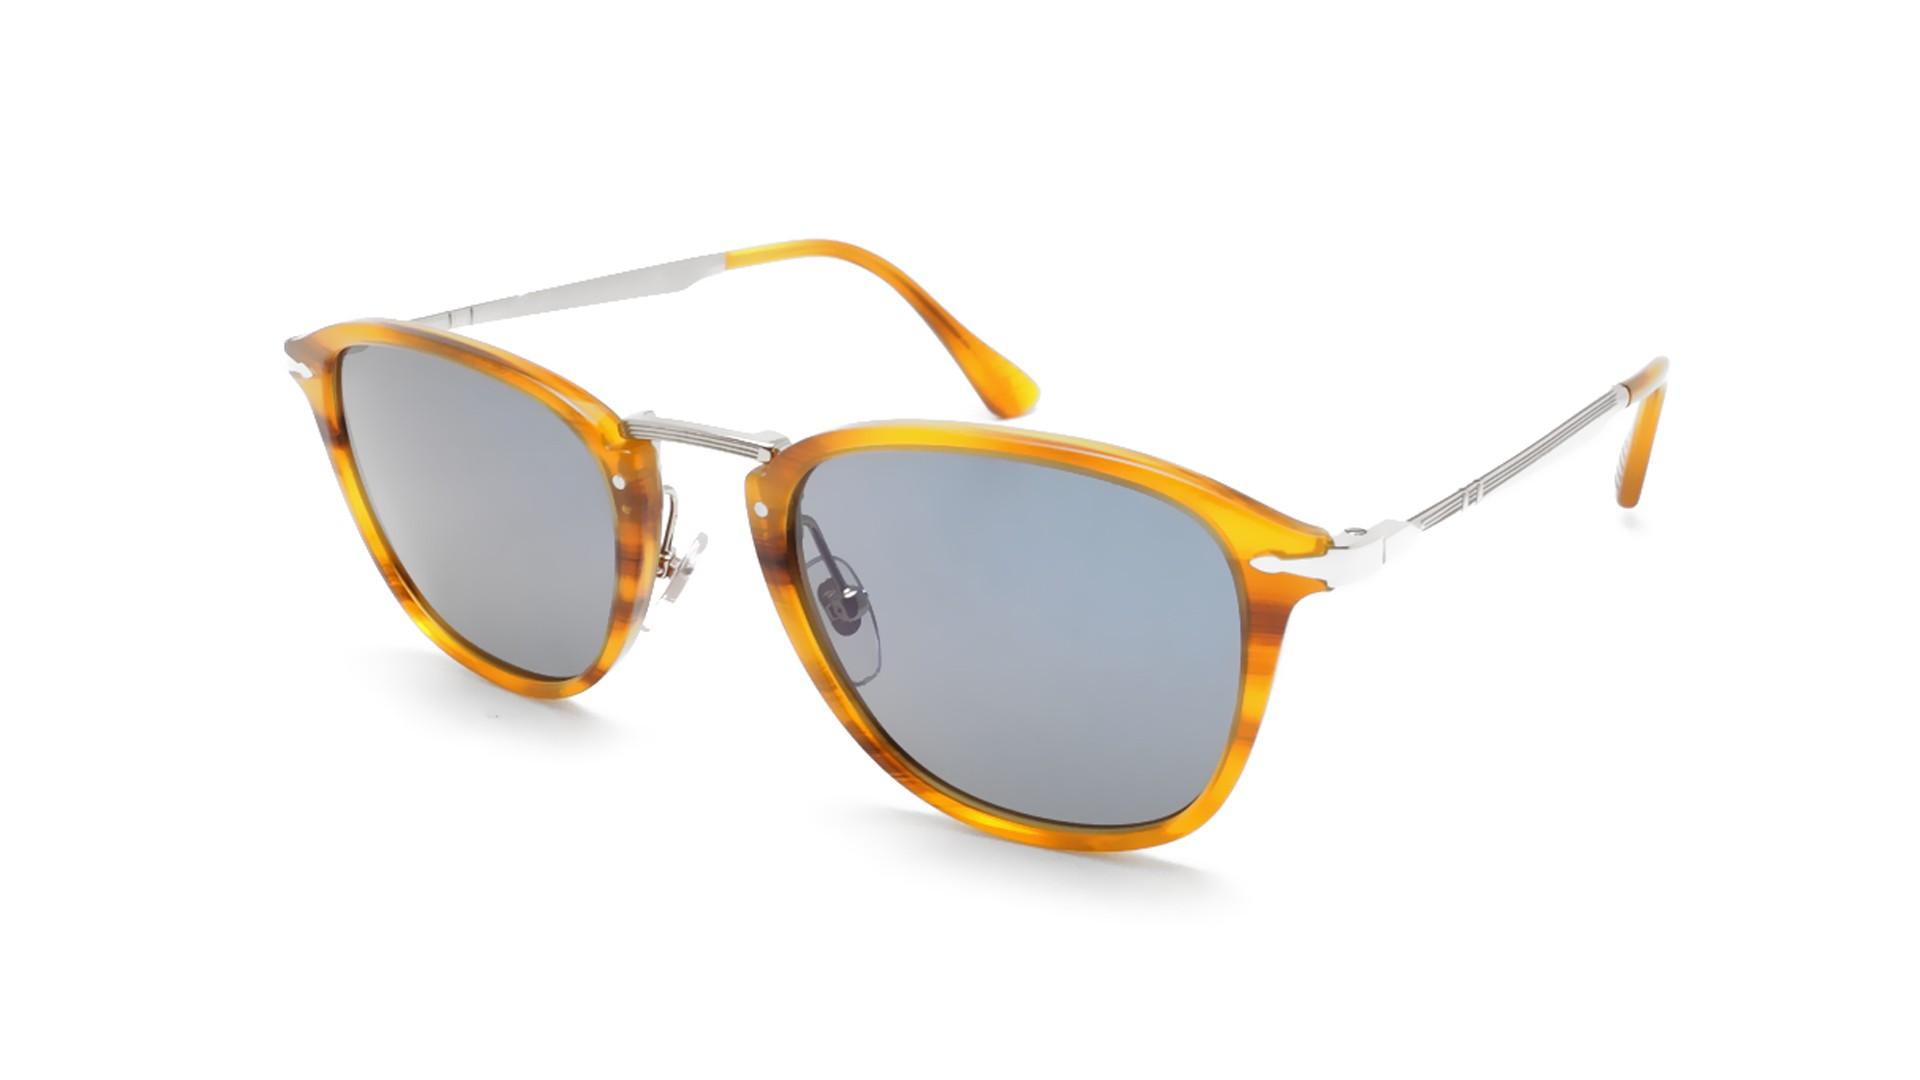 126d803e40 Sunglasses Persol Calligrapher Edition Tortoise PO3165S 960 56 50-22 Medium  Flash